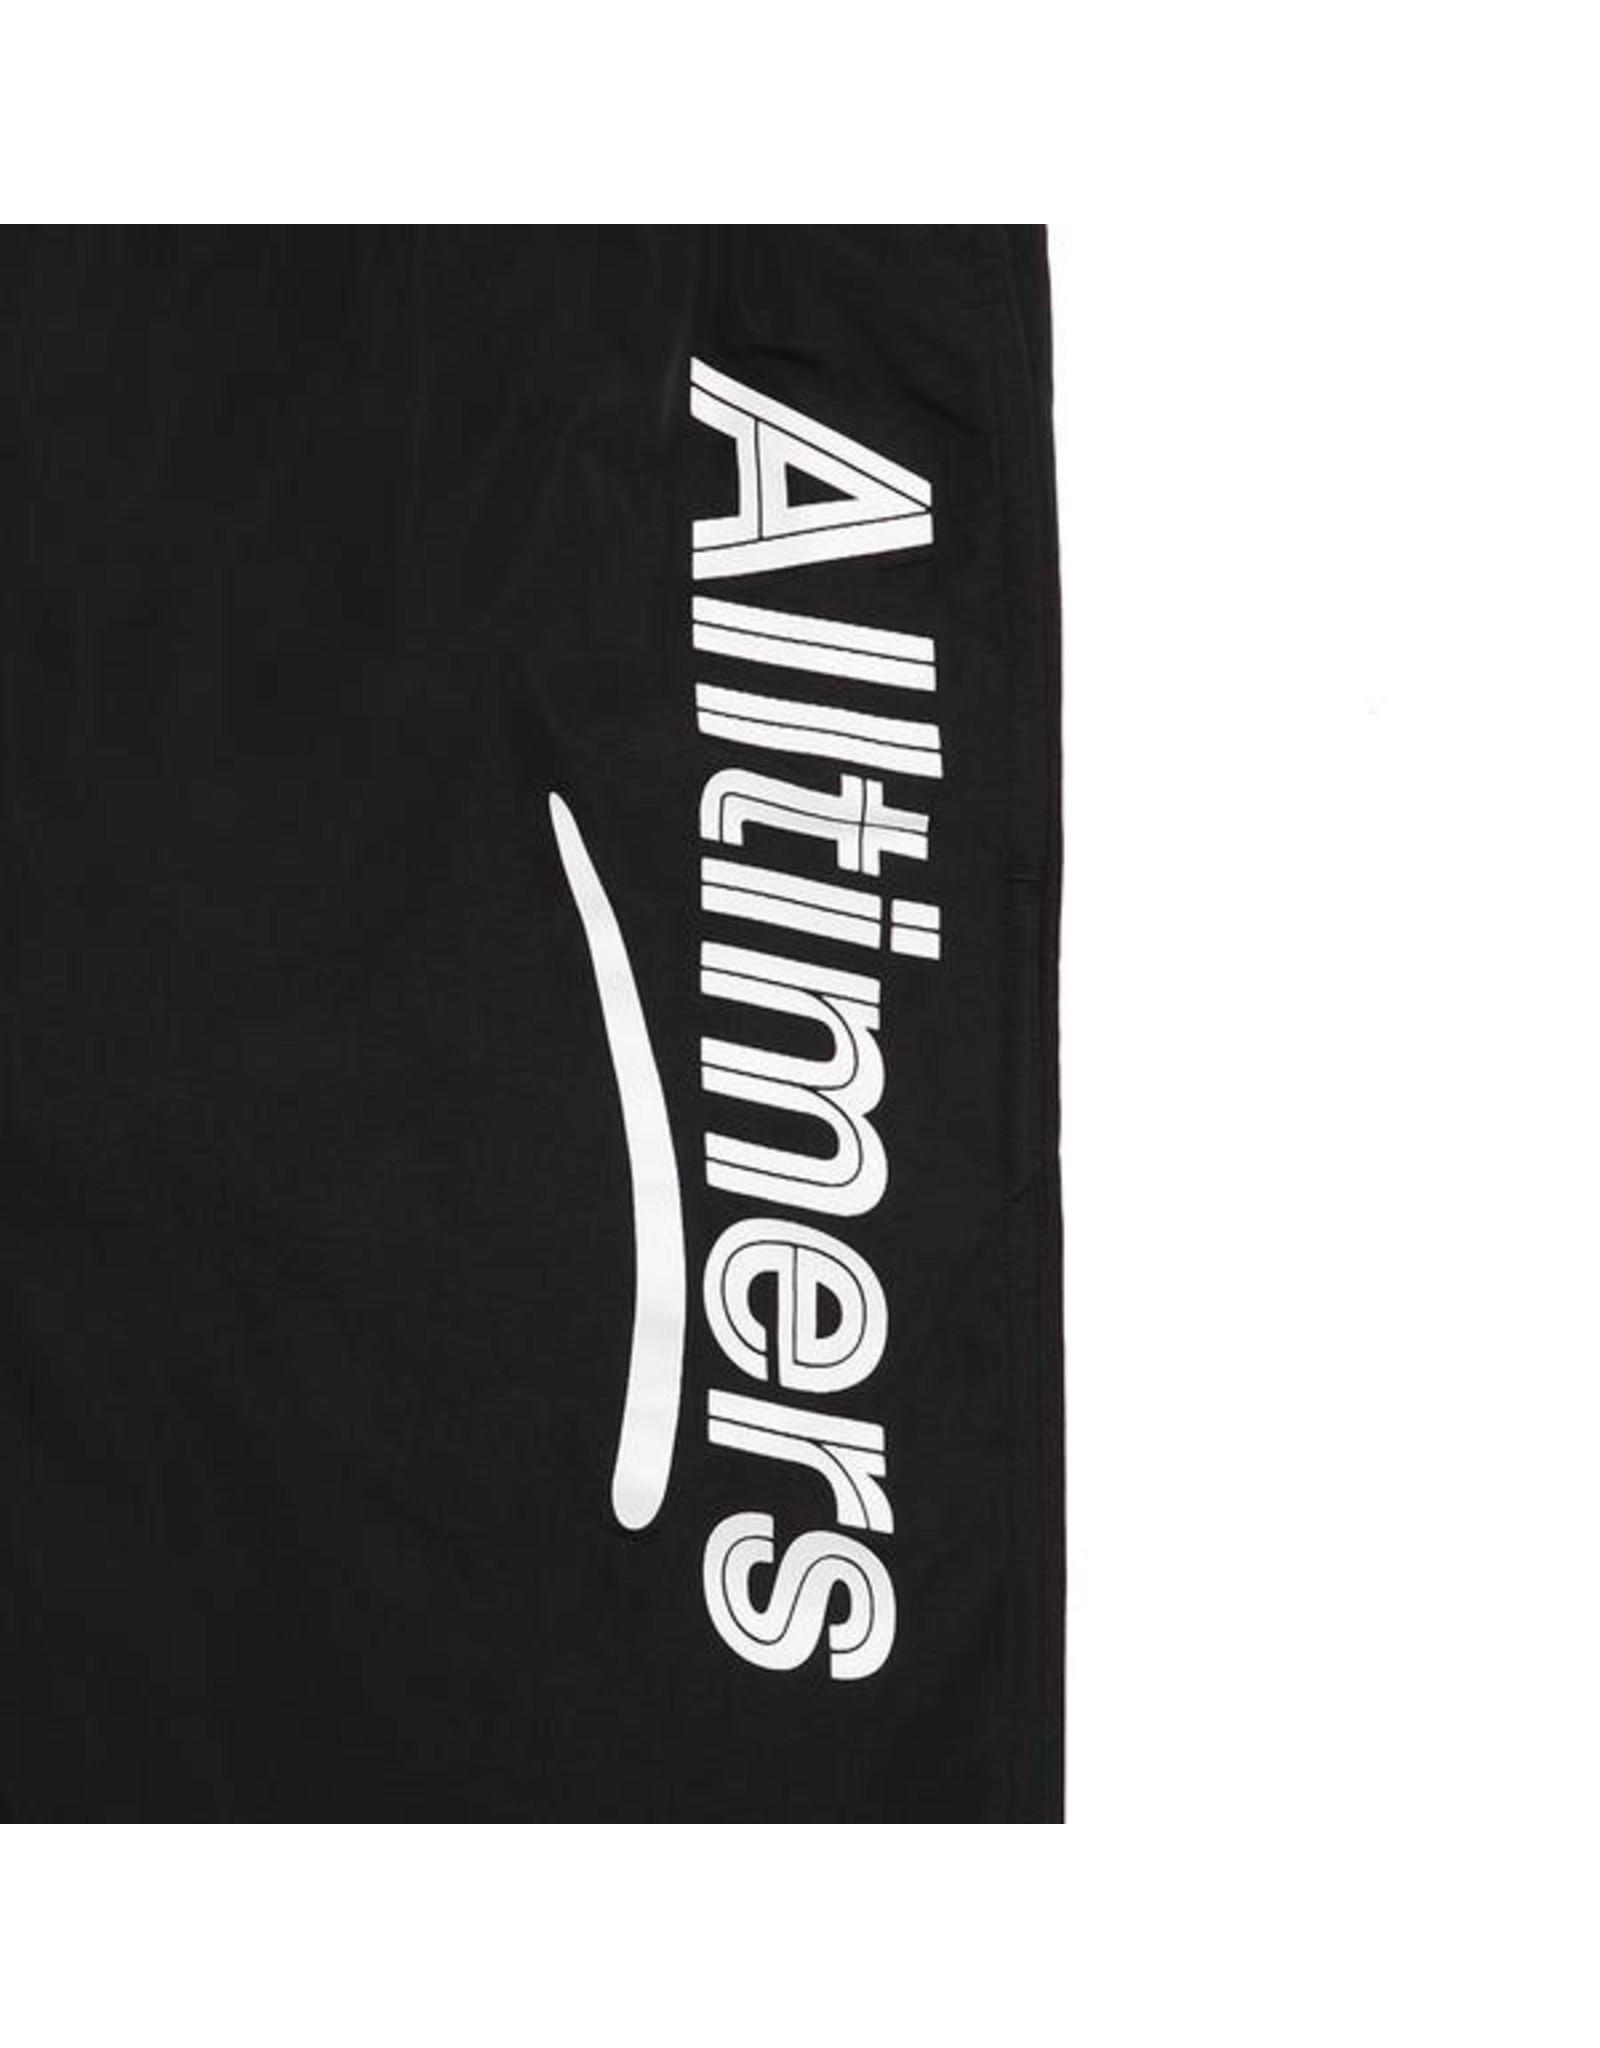 ALLTIMERS ALLTIMERS - SWIM SHORTS - BLACK -